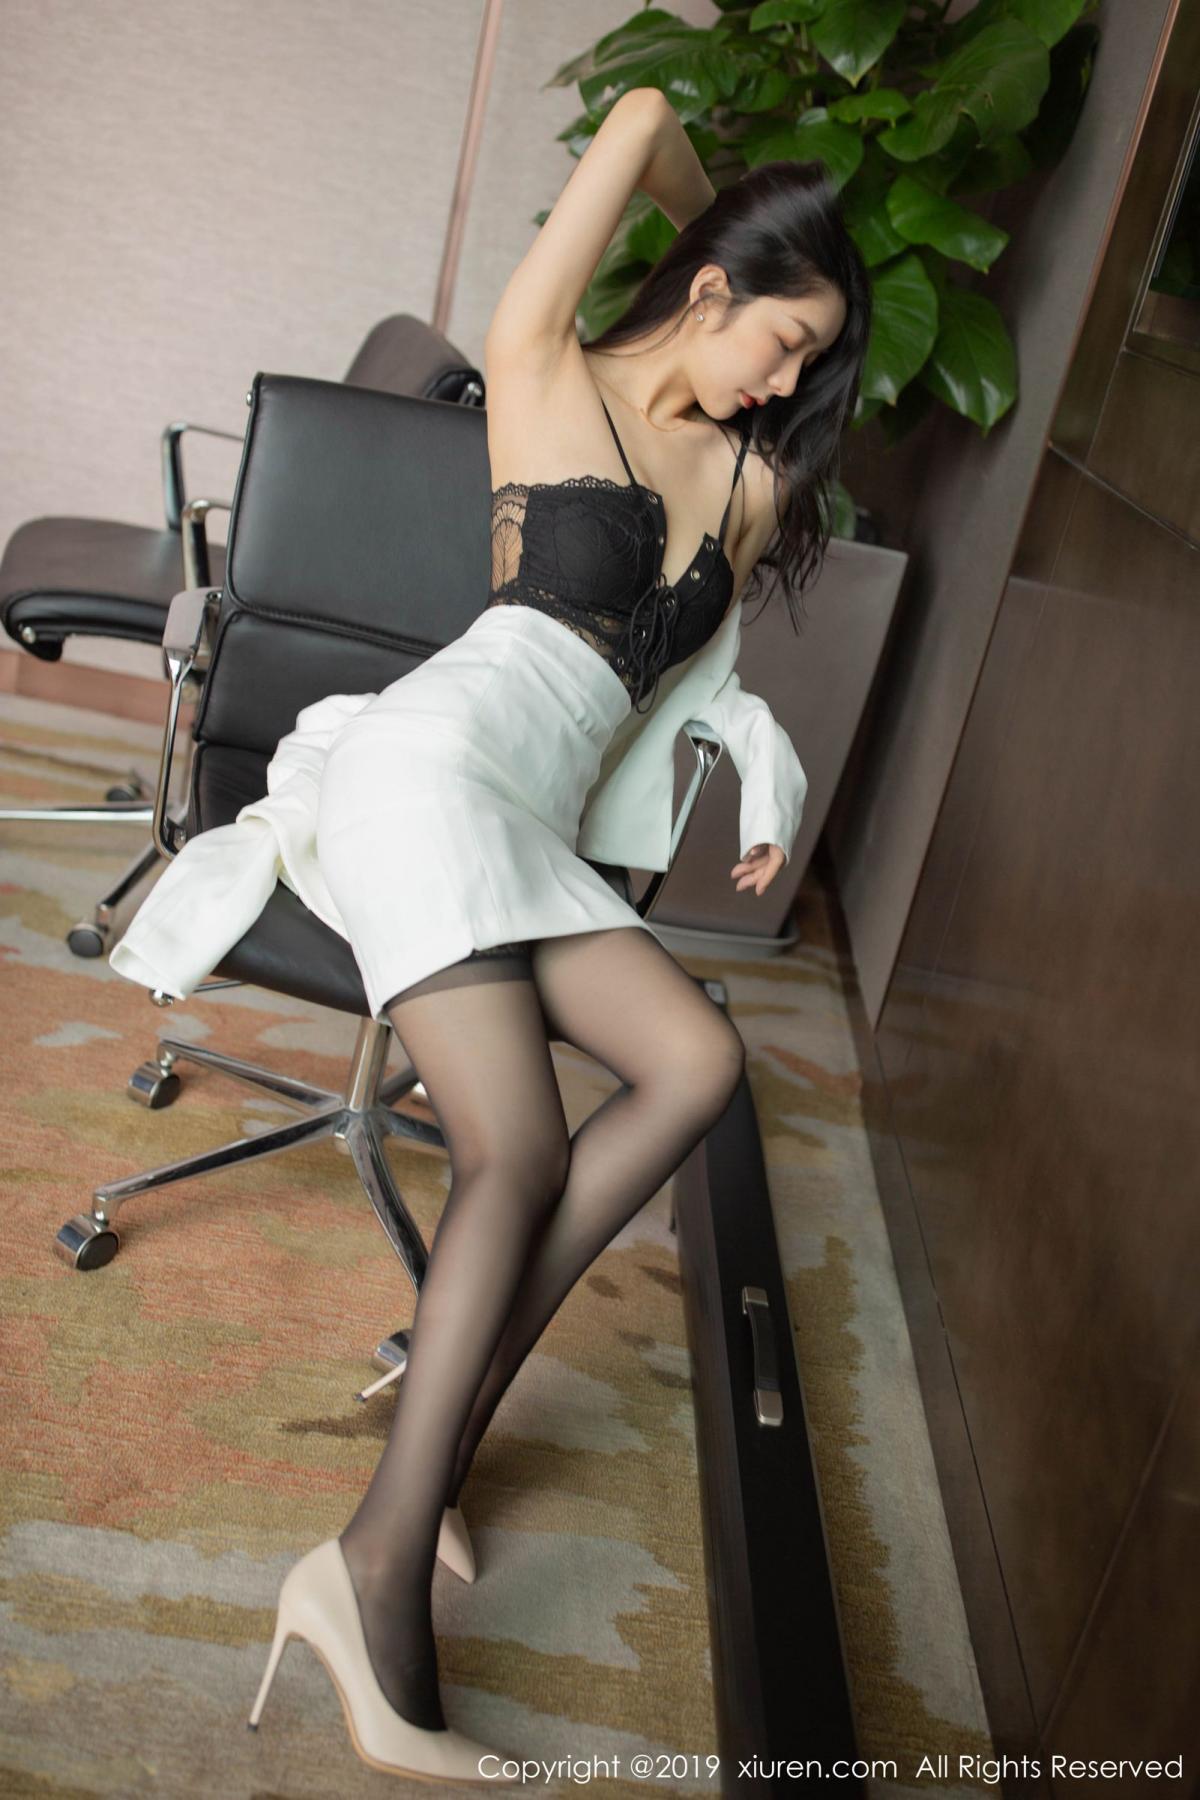 [XiuRen] Vol.1821 Come to my room and sit after you get off work 12P, Black Silk, Di Yi, Xiuren